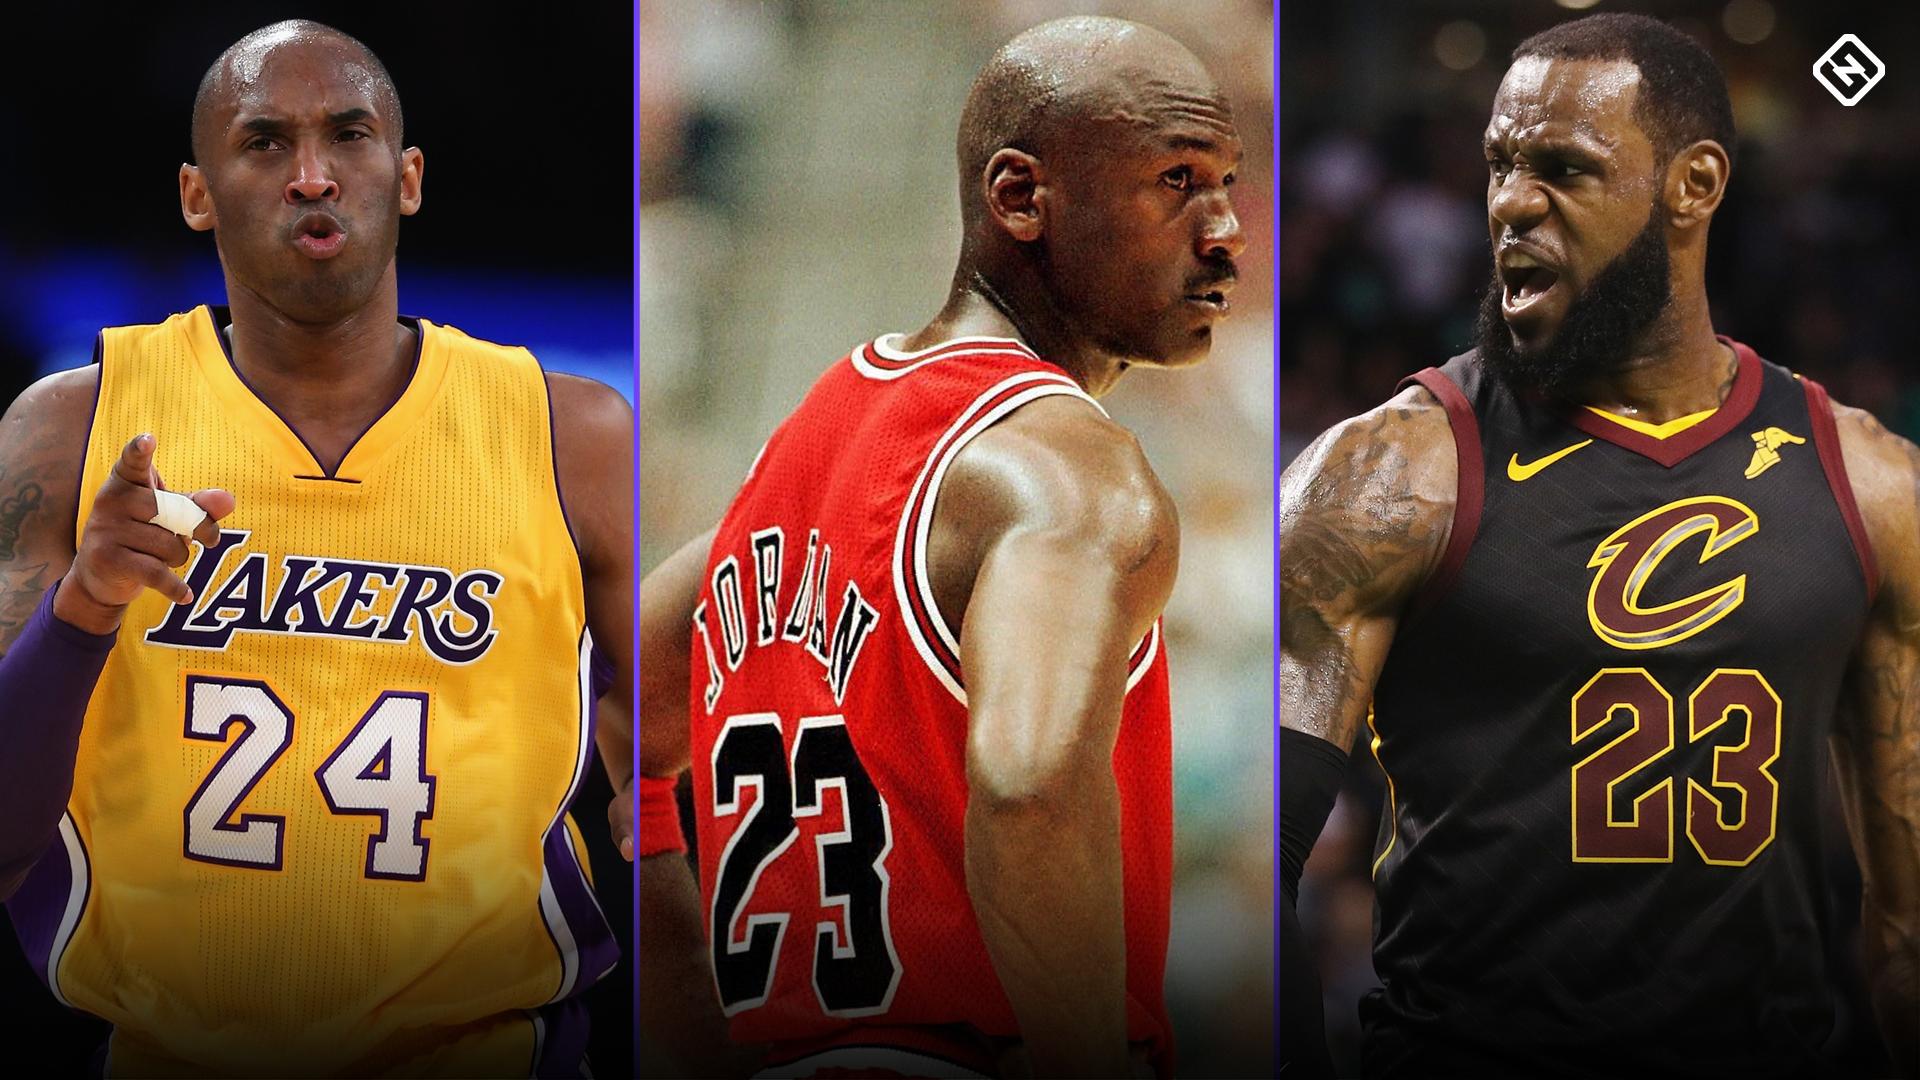 Kobe Bryant Jumping Into Lebron James Michael Jordan Debate Is Wonderfully Kobe Move Sporting News